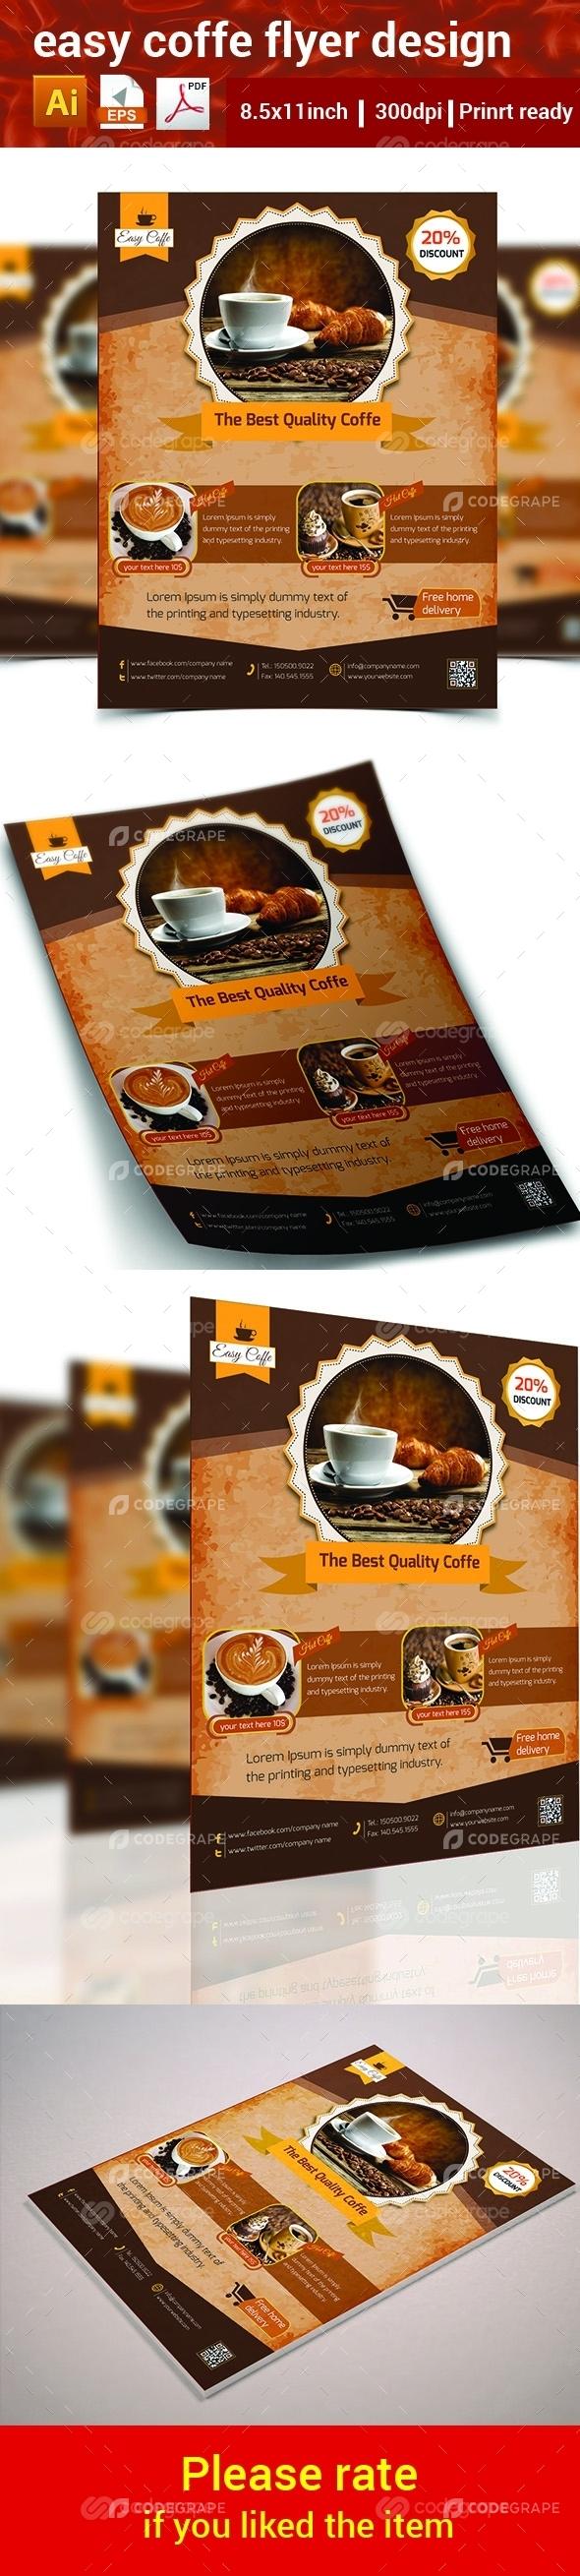 Easy Coffee Flyer